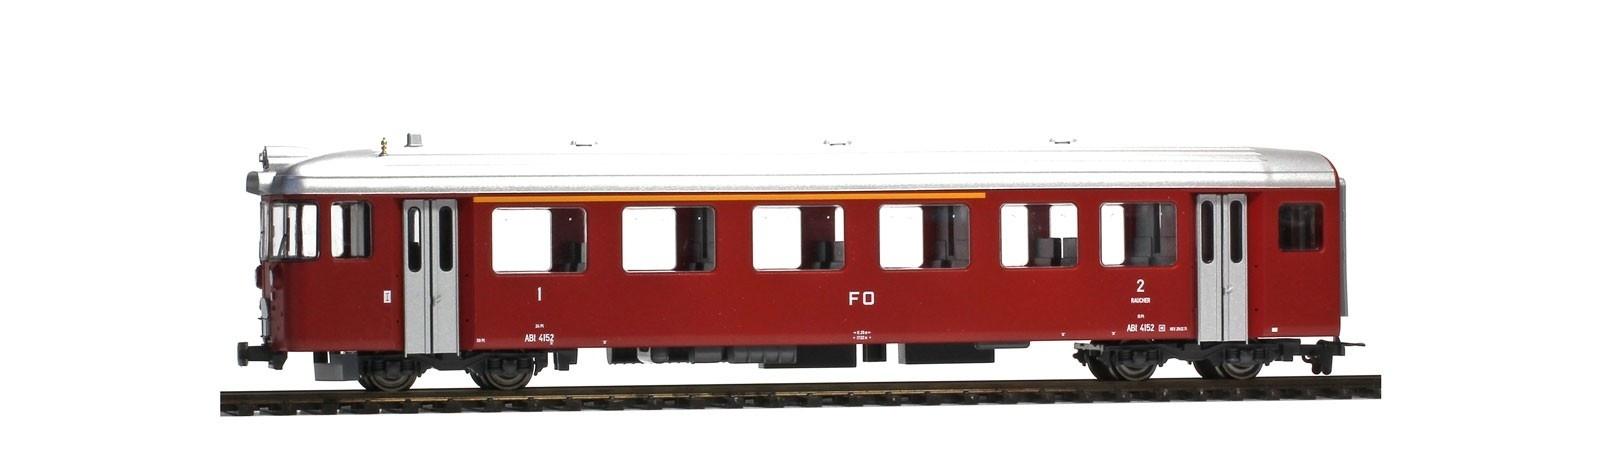 3275202 FO ABt 4152 Steuerwagen dunkelrot-1